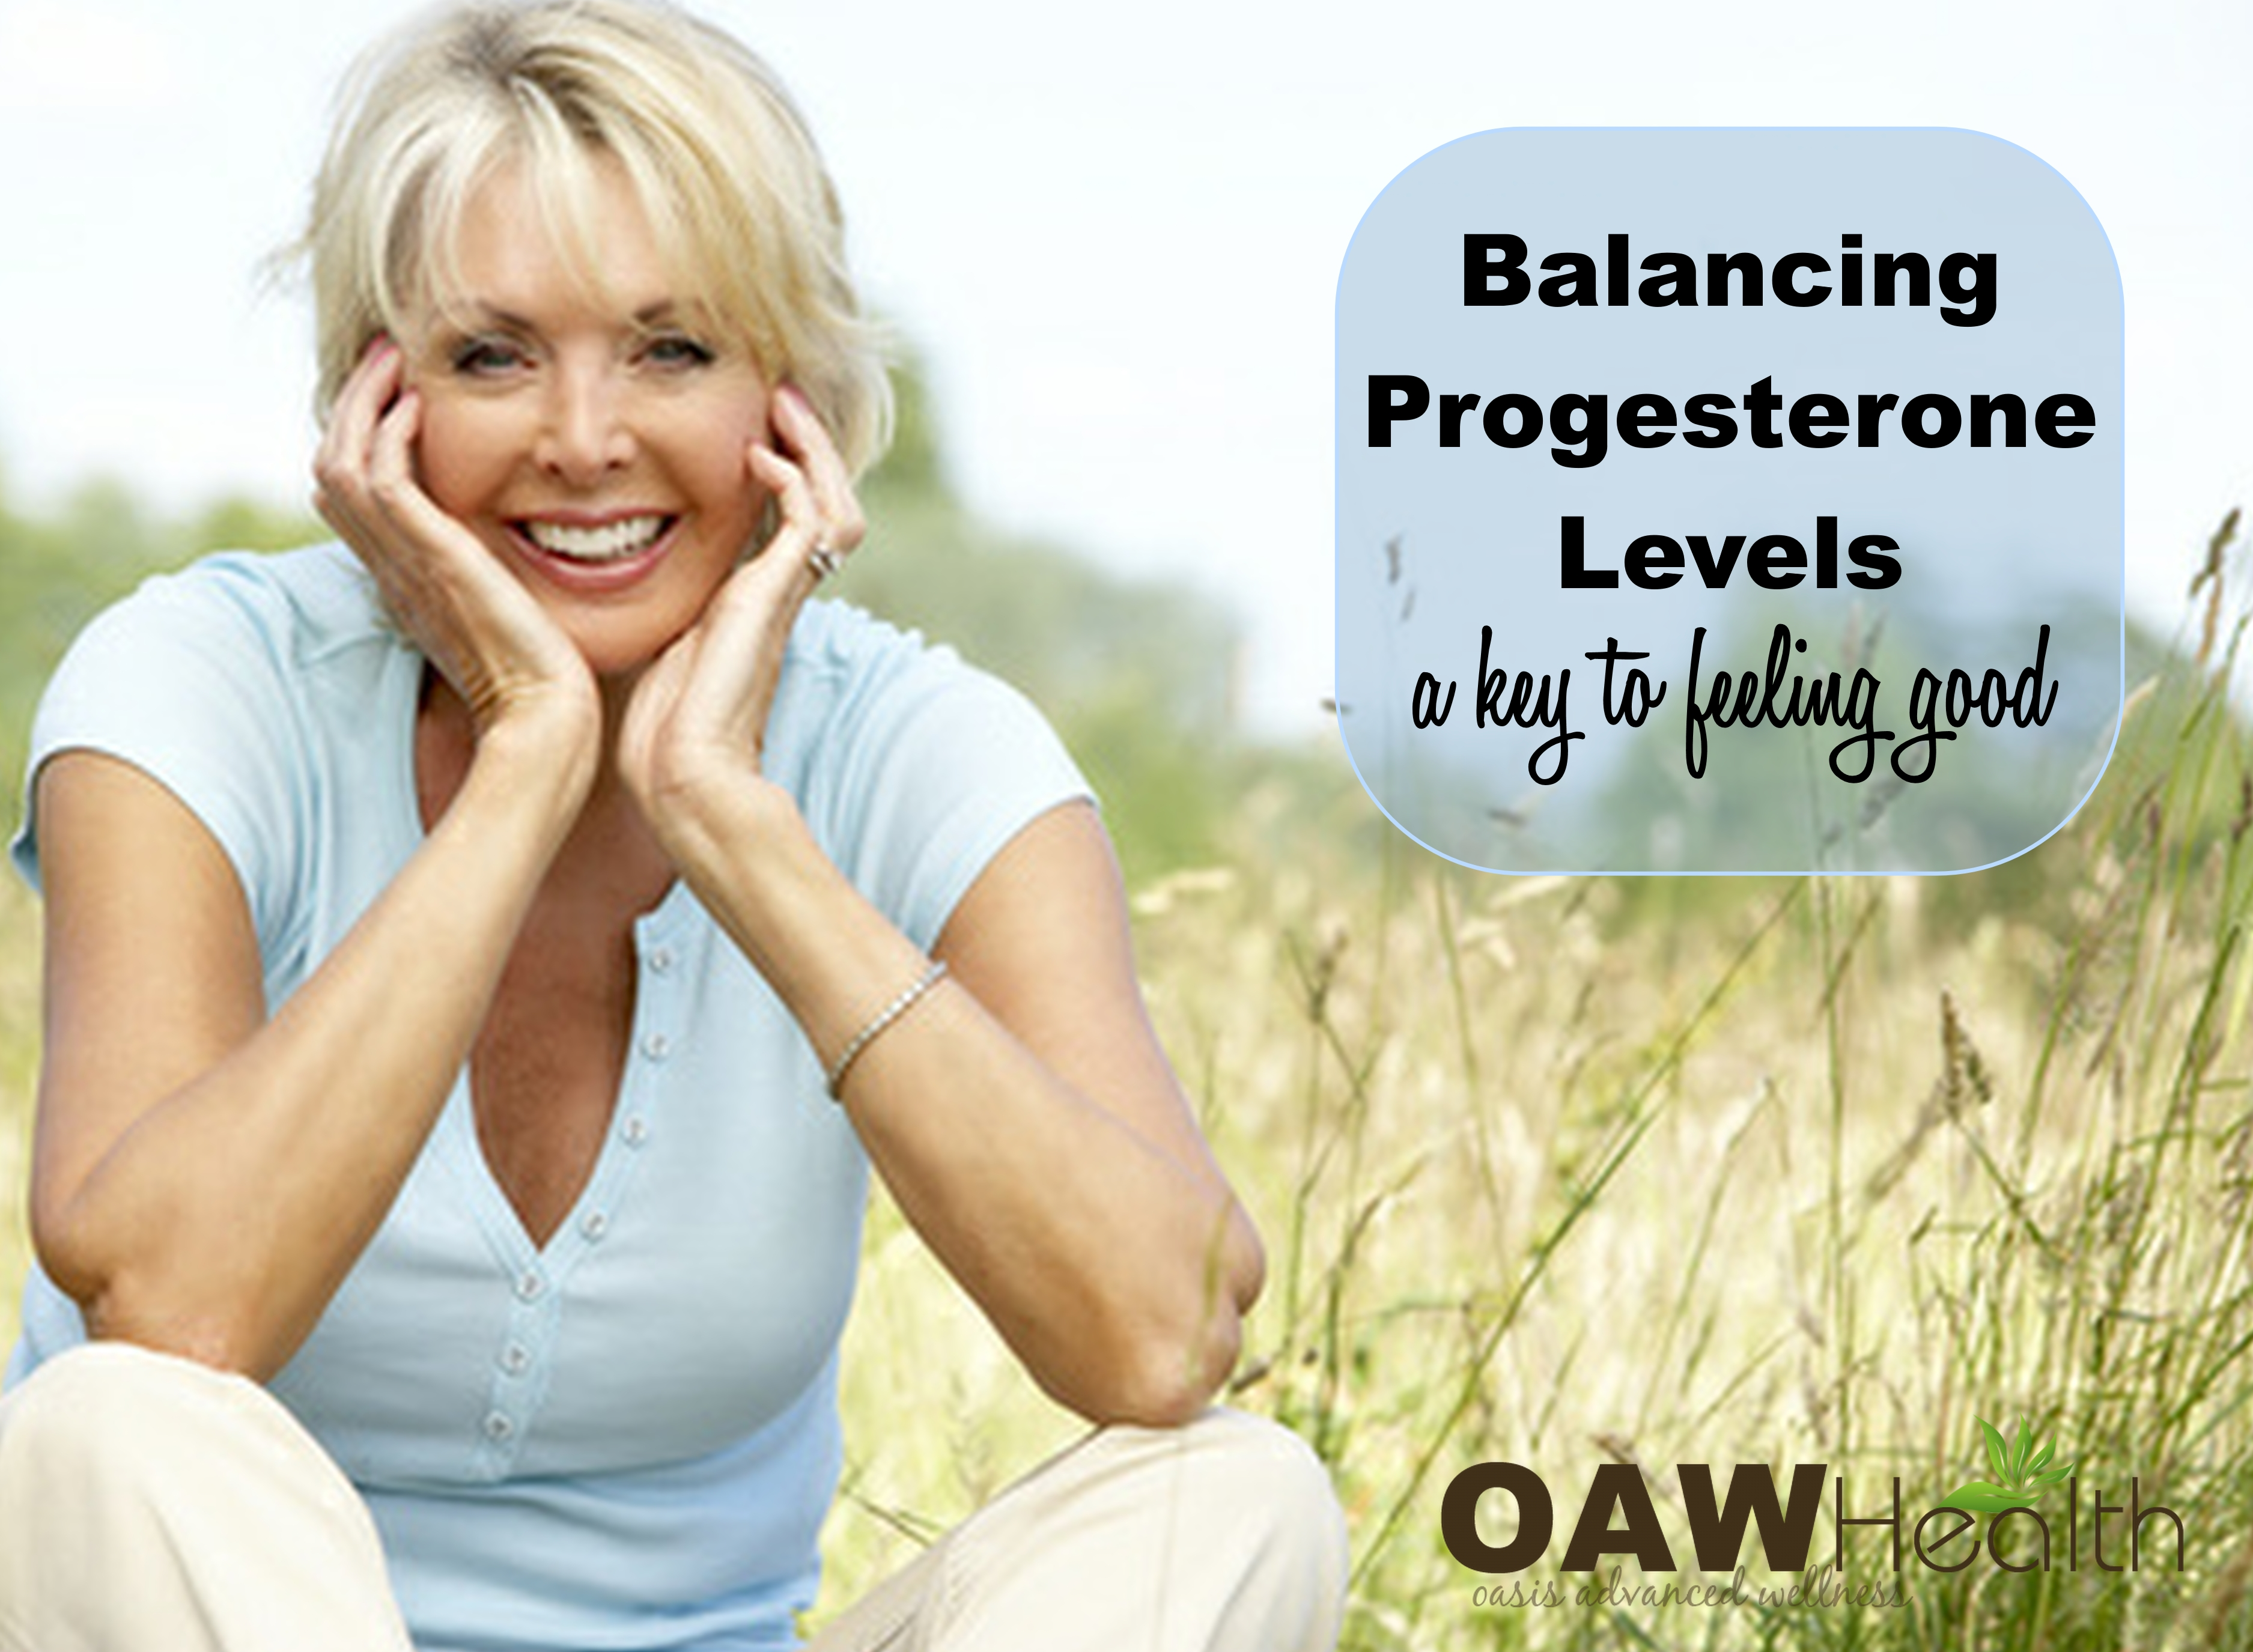 Balancing Progesterone Levels – A Key to Feeling Good